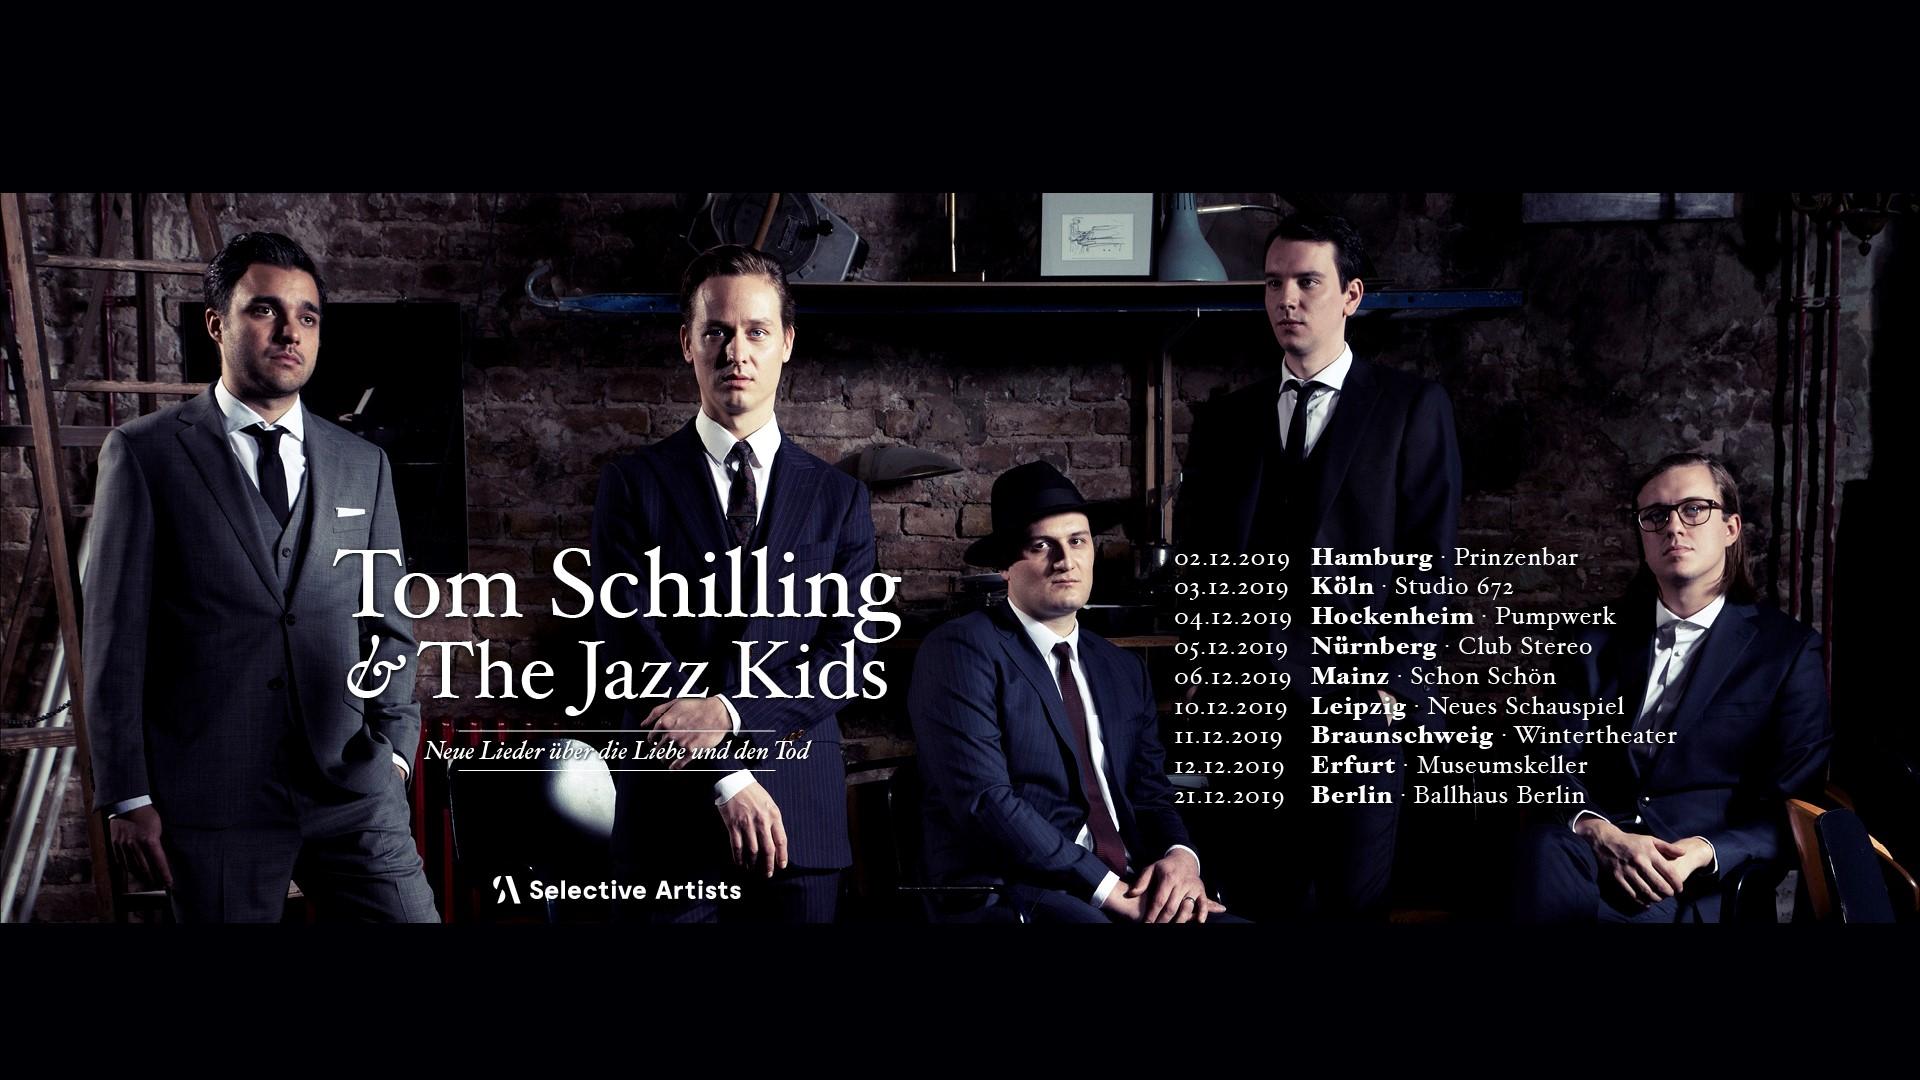 Tom Schilling & The Jazz Kids